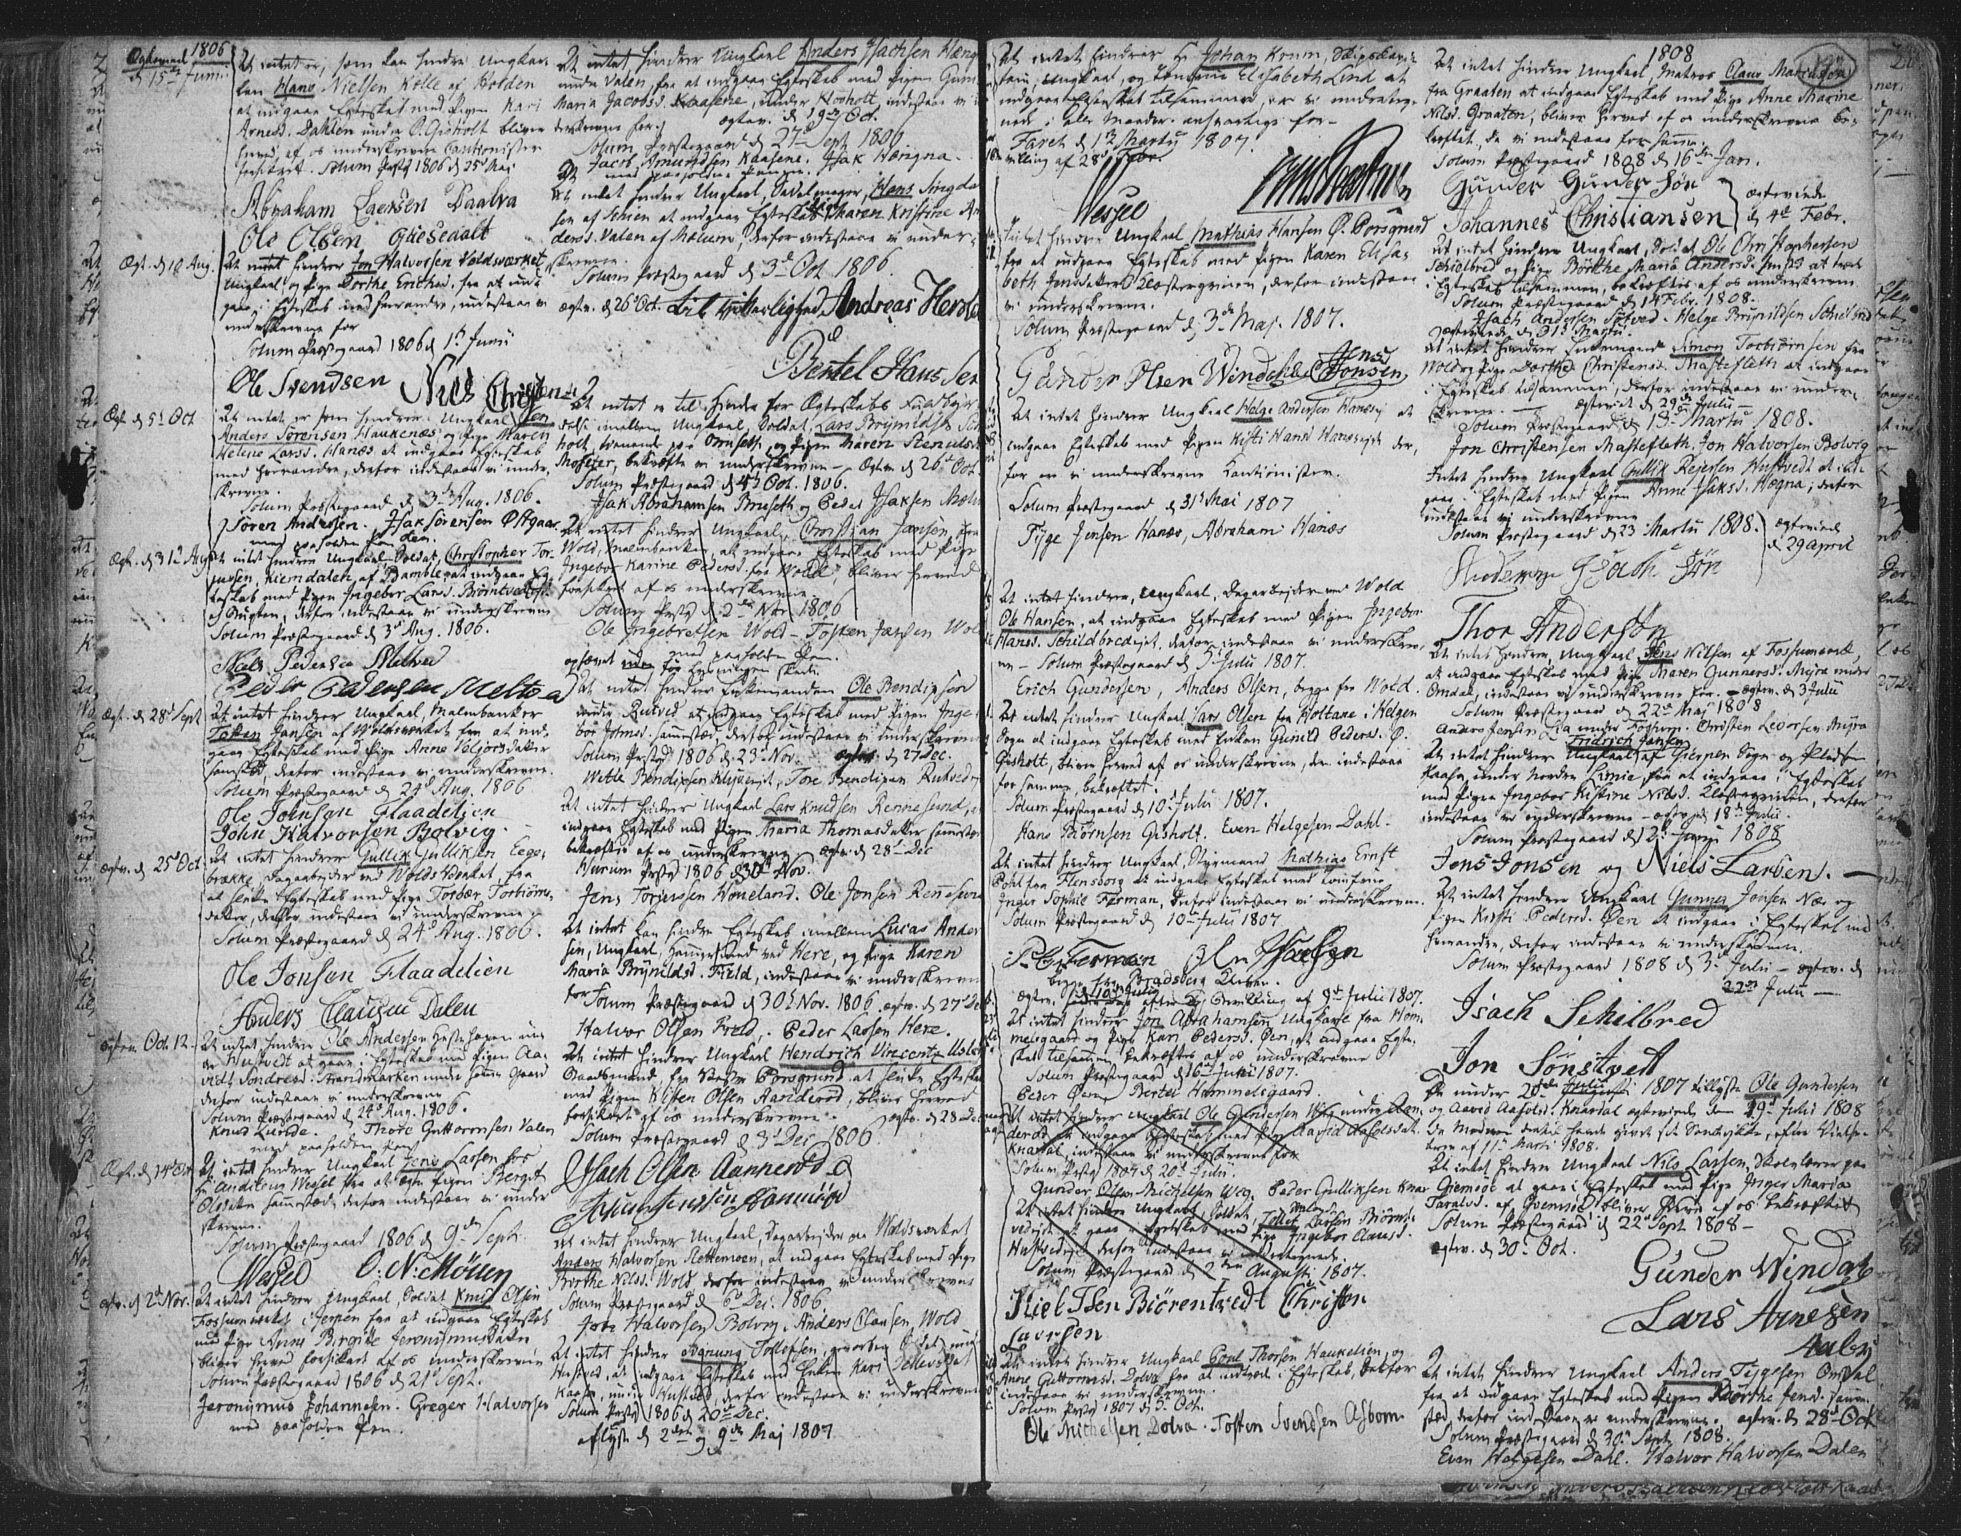 SAKO, Solum kirkebøker, F/Fa/L0003: Ministerialbok nr. I 3, 1761-1814, s. 192a-192b